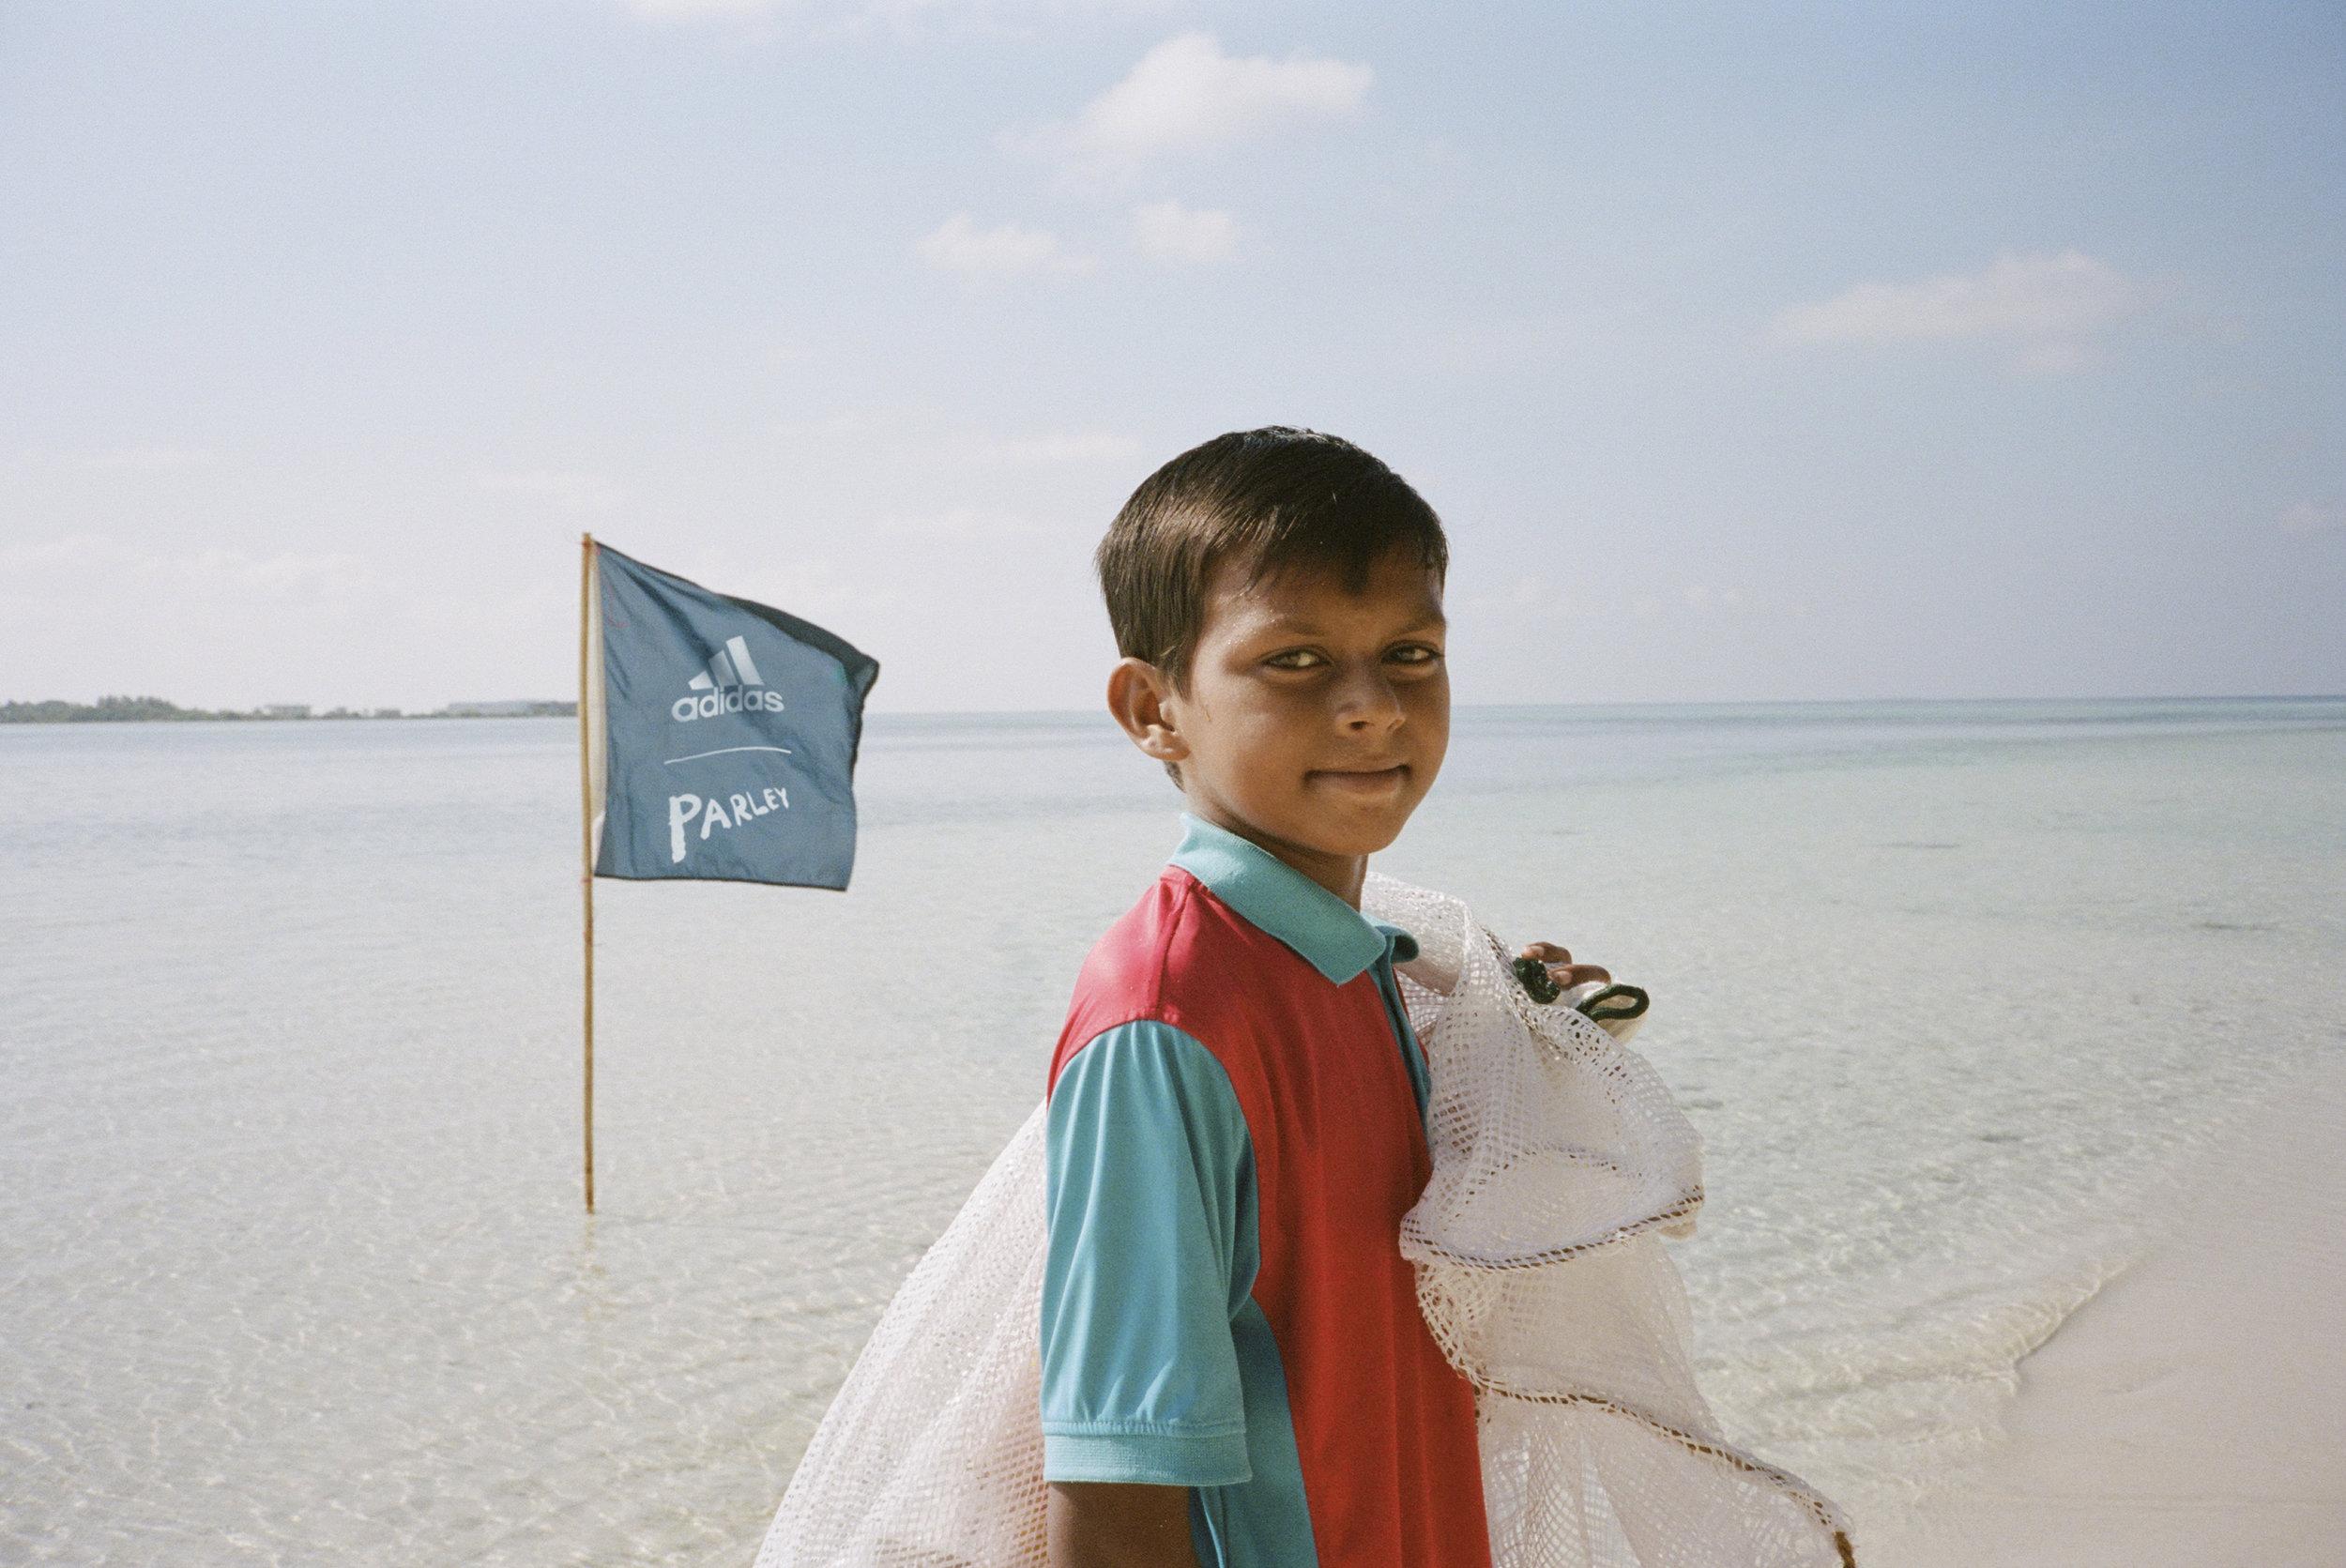 a-parley-flag-v1.jpg